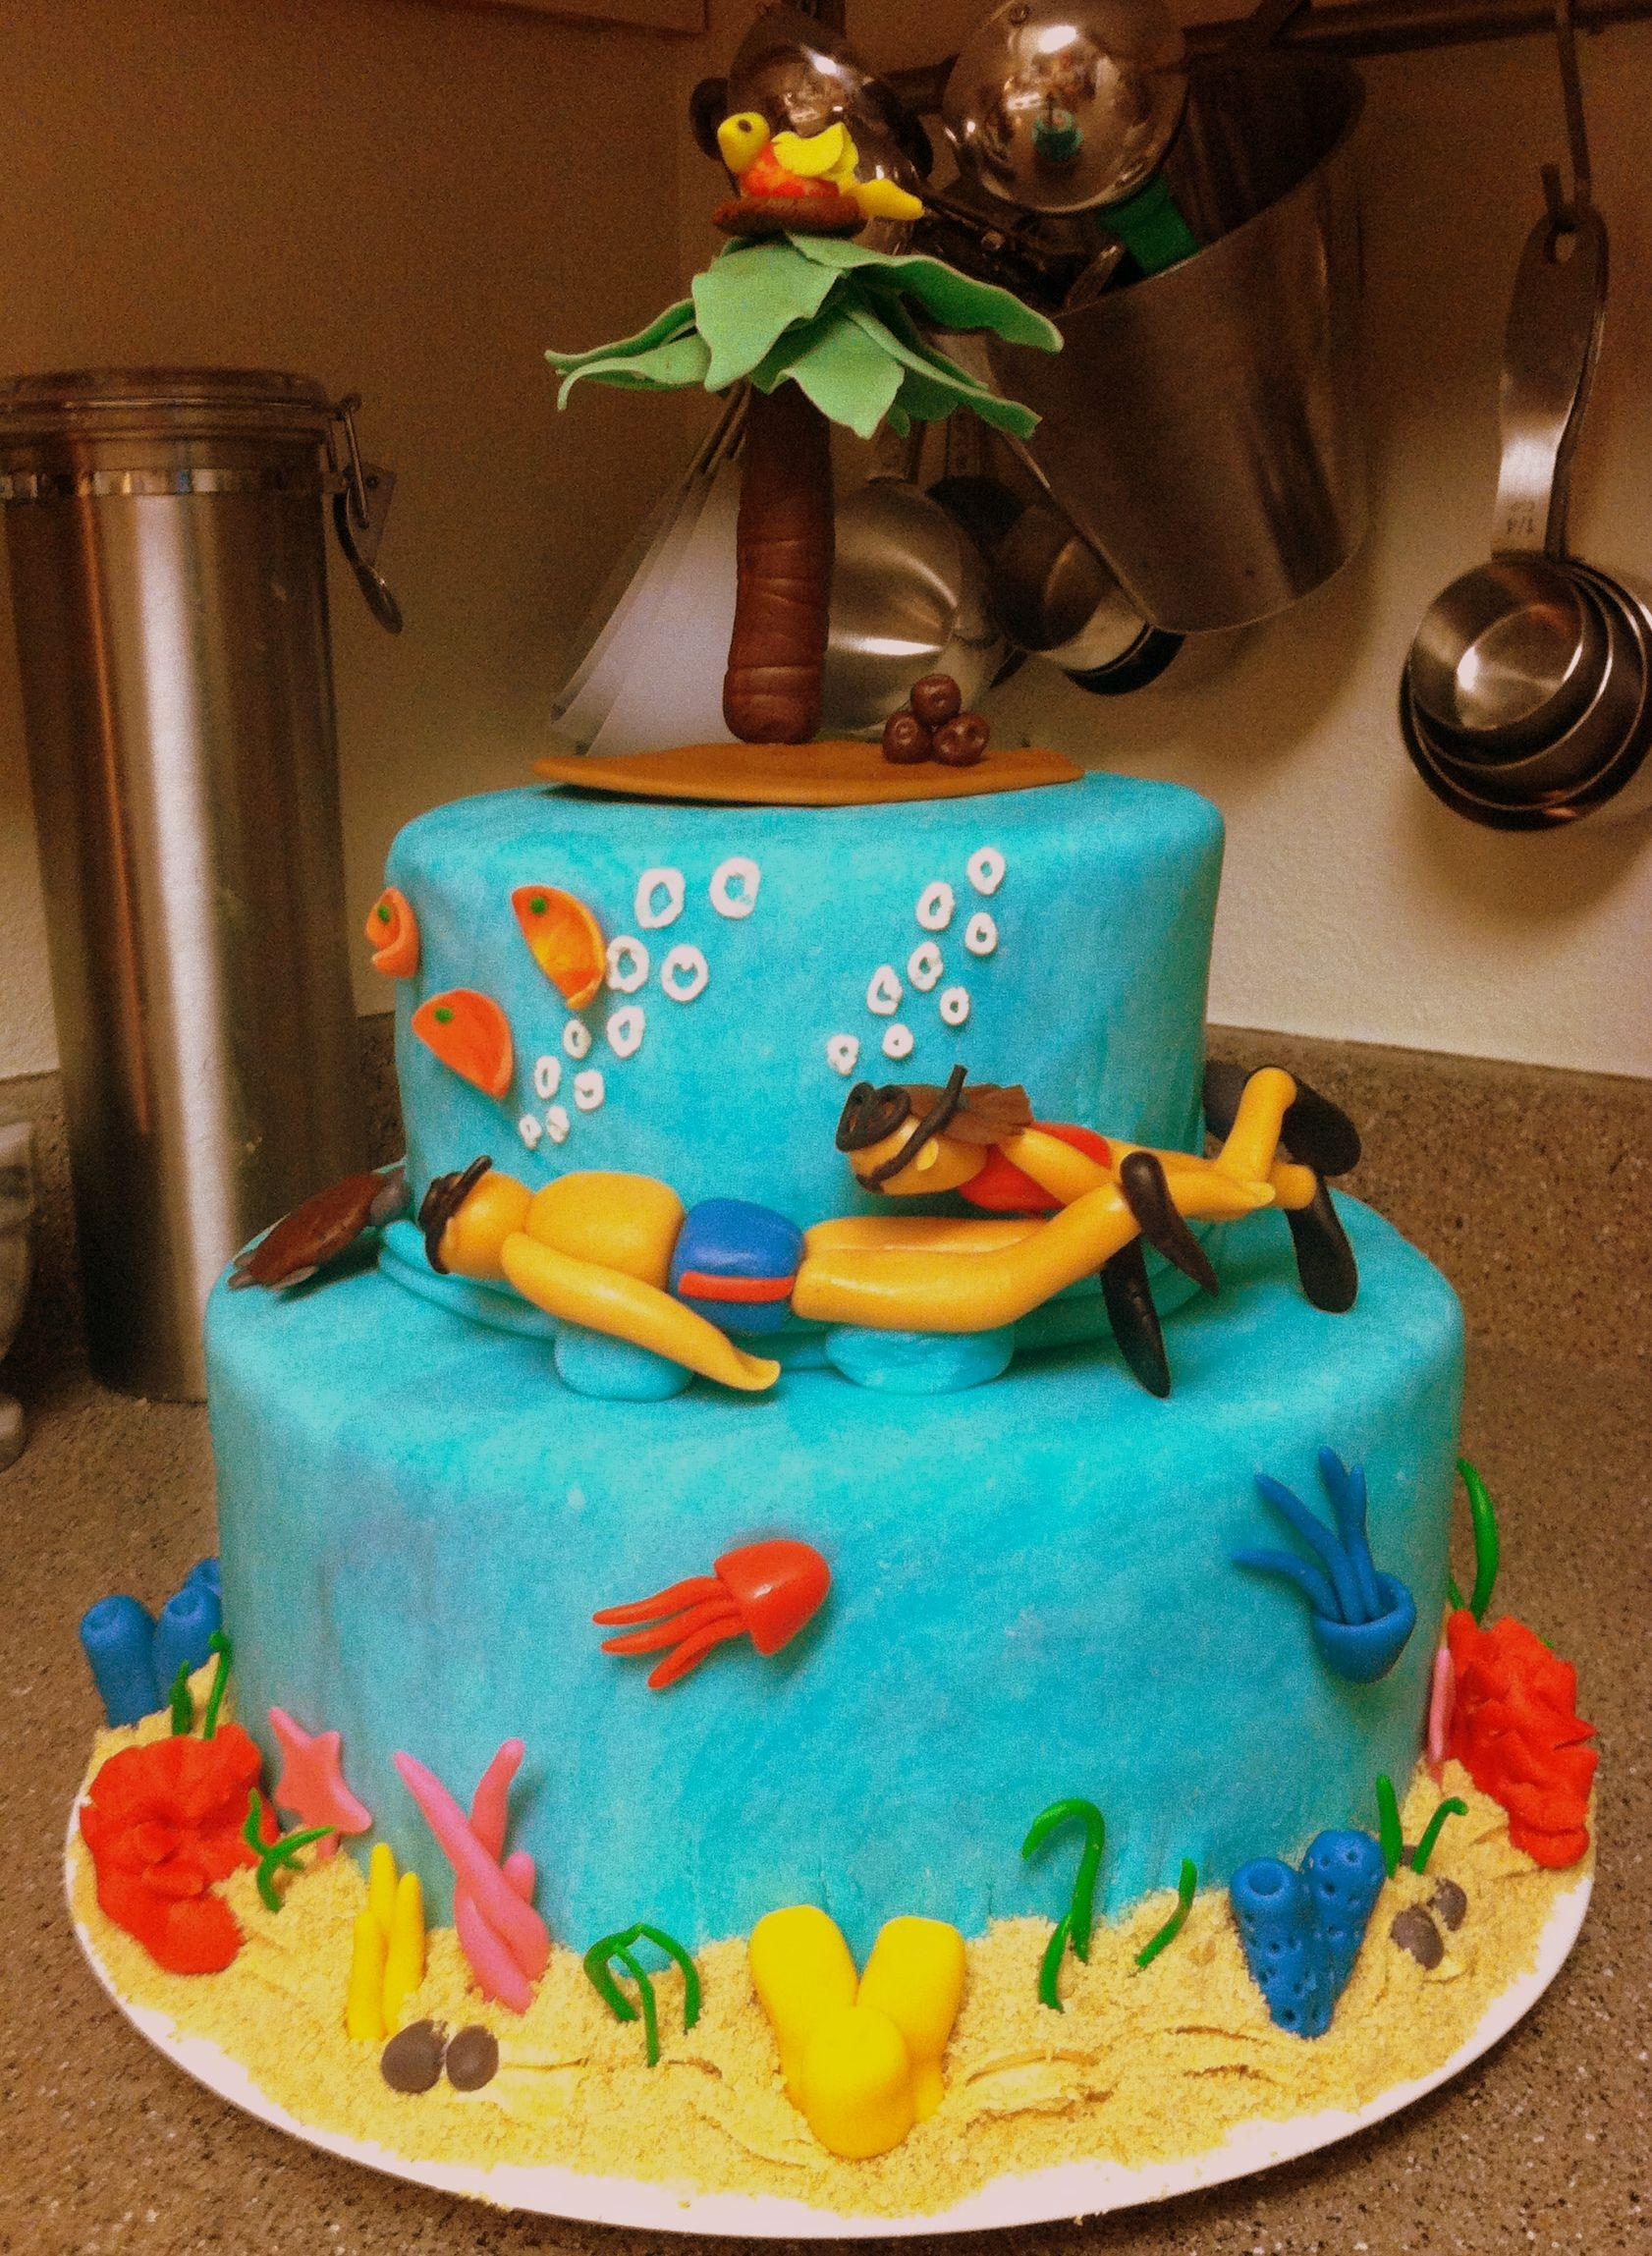 Snorkel Anniversary Cake Coconut Cake With Coconut And Macadamia